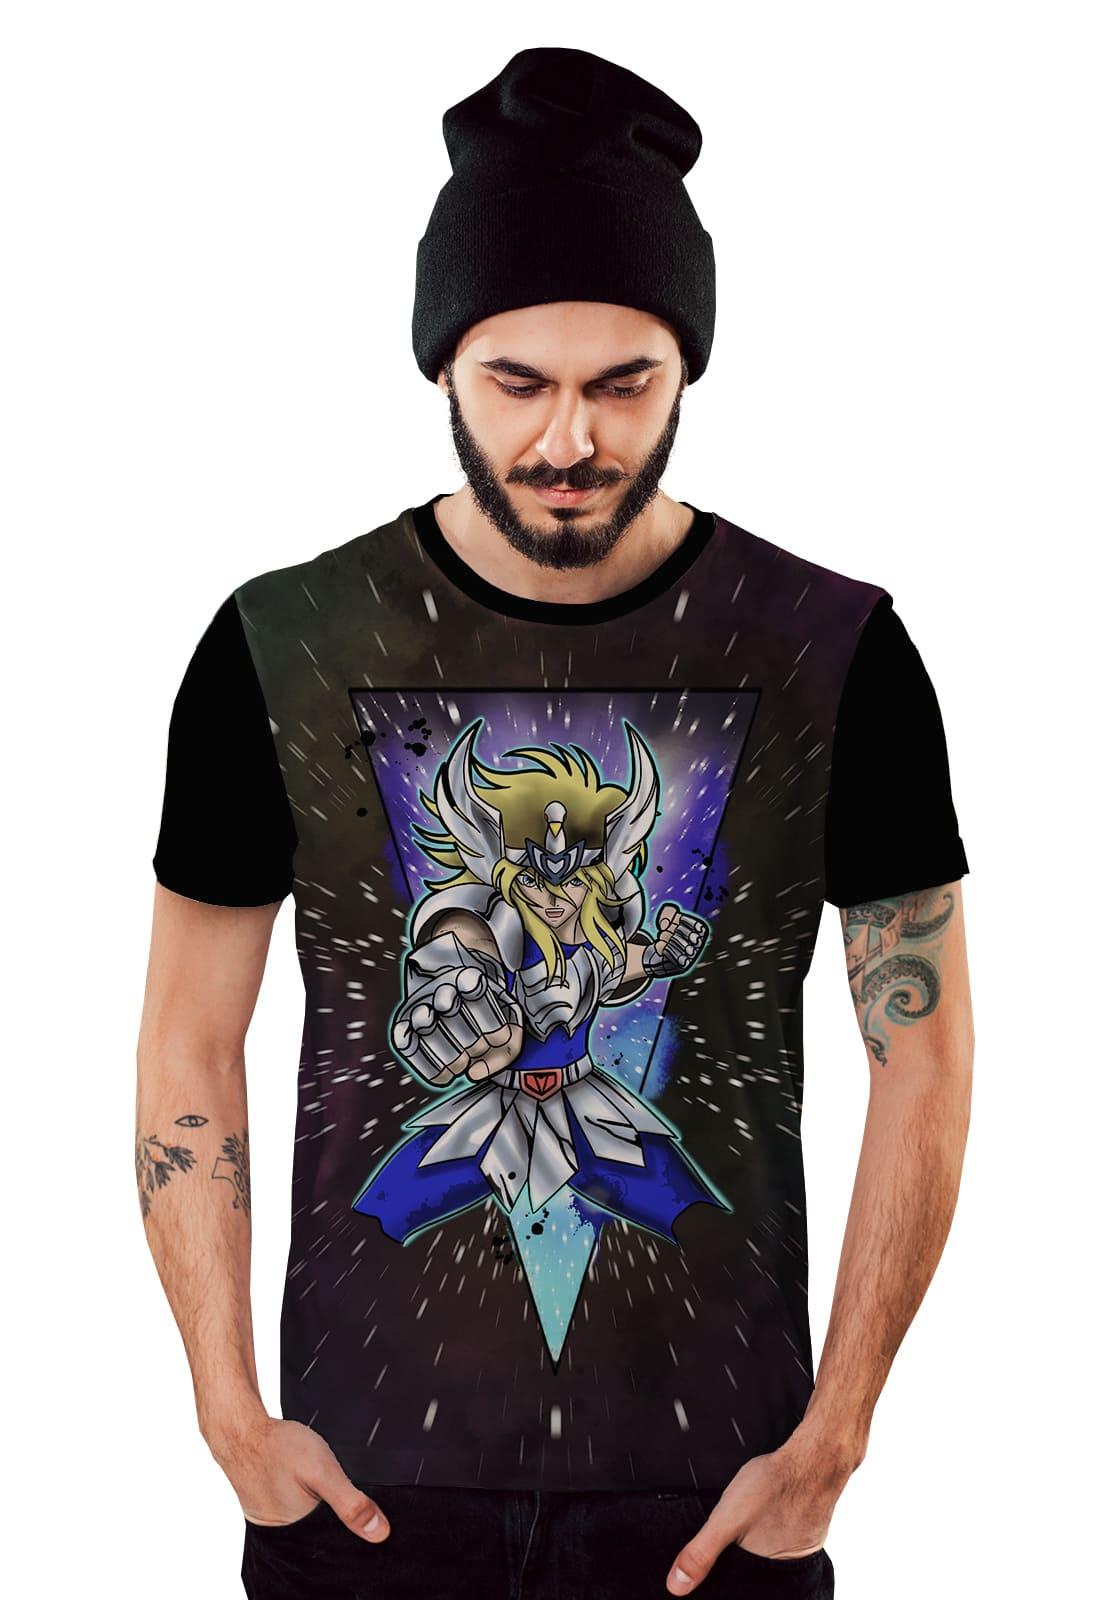 Camiseta Cavaleiro dos Zodiaco Hyoga